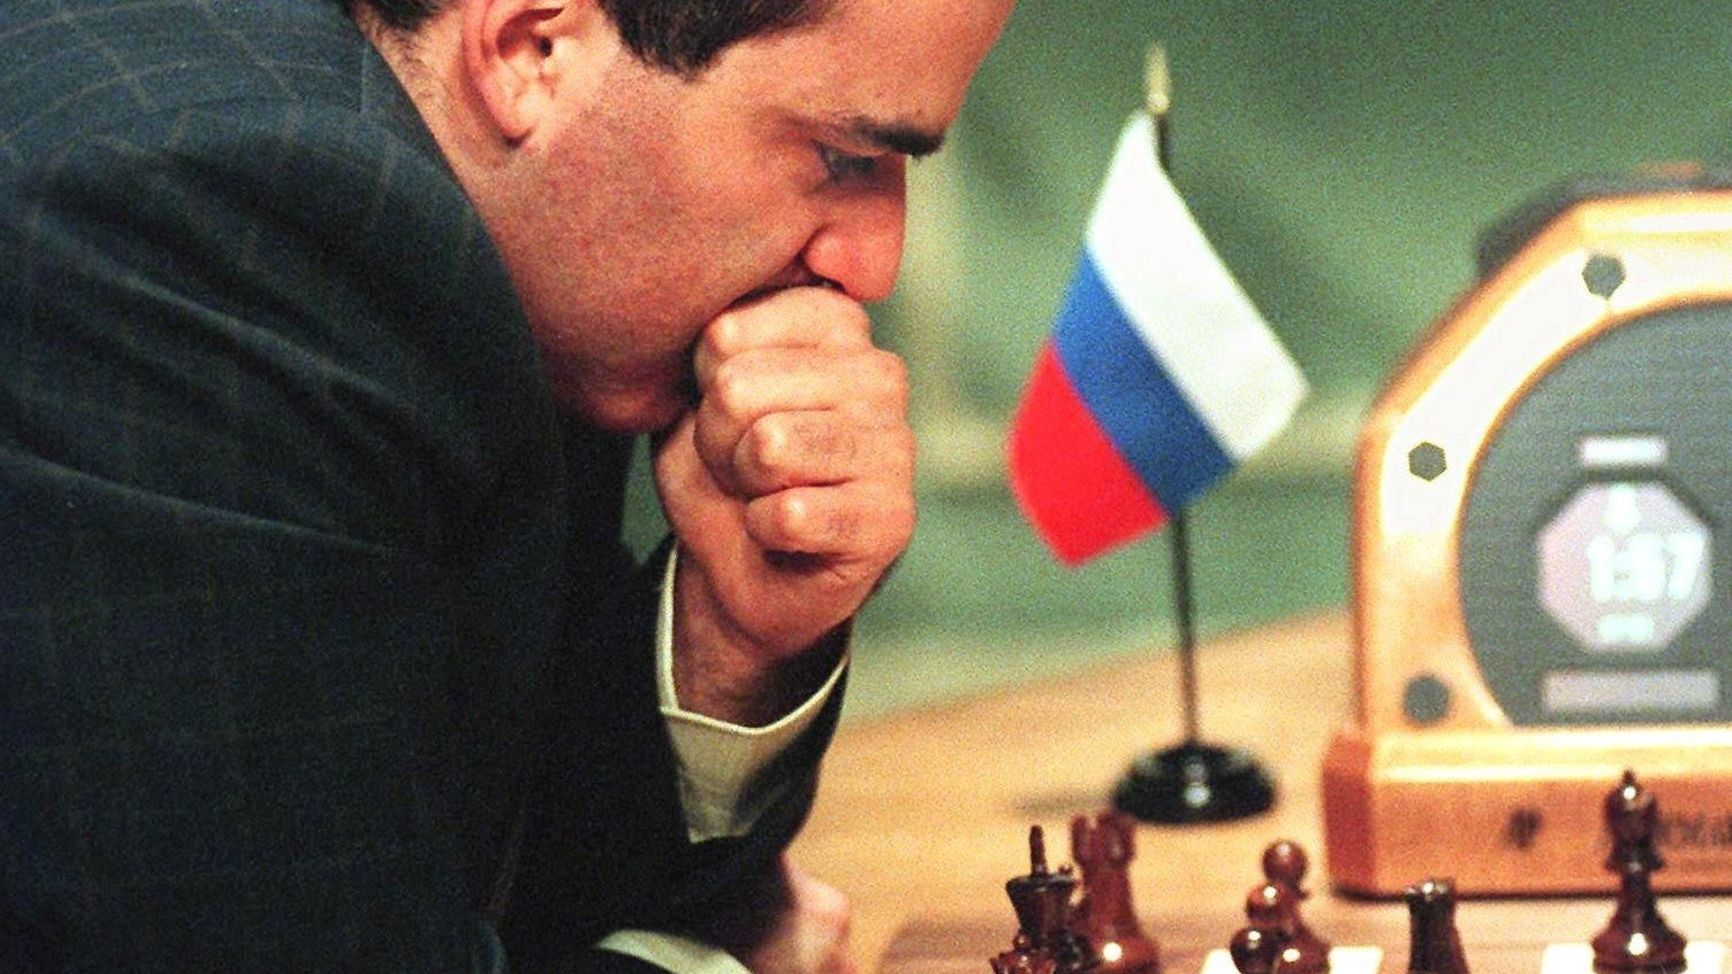 KI bezwingt Schachweltmeister